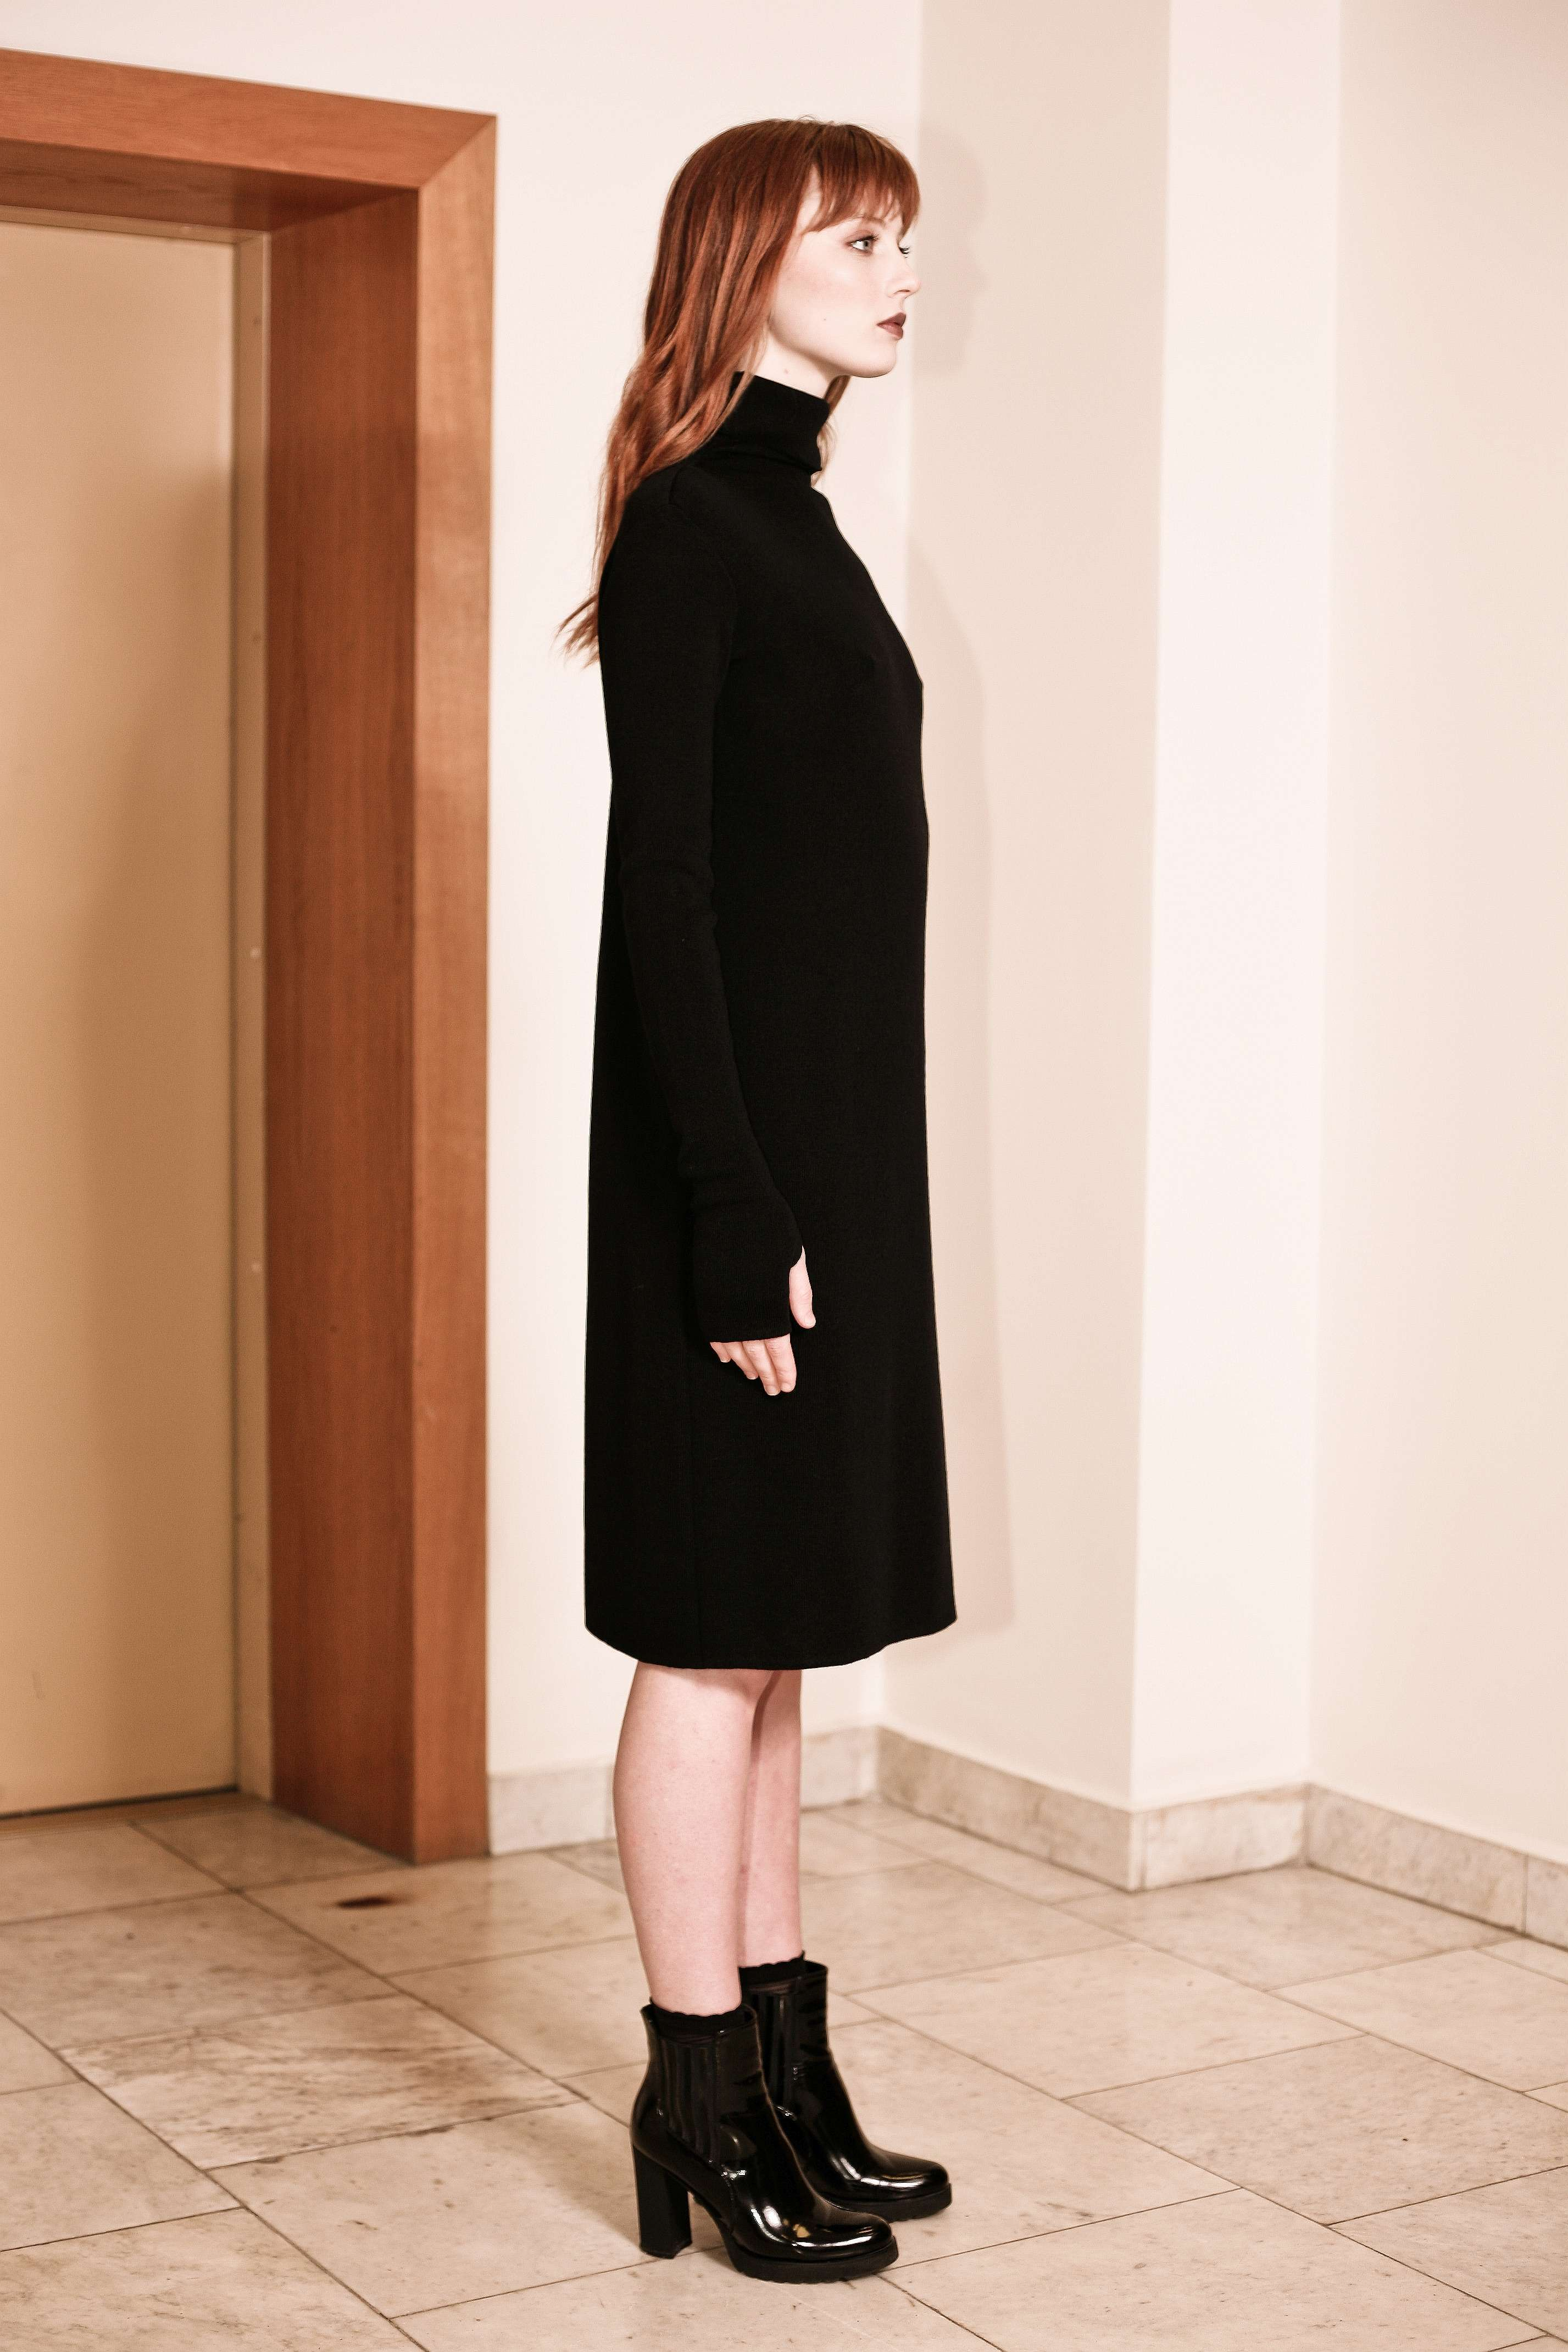 fbaef32d8f23 Black merino turtleneck knee length dress JANET